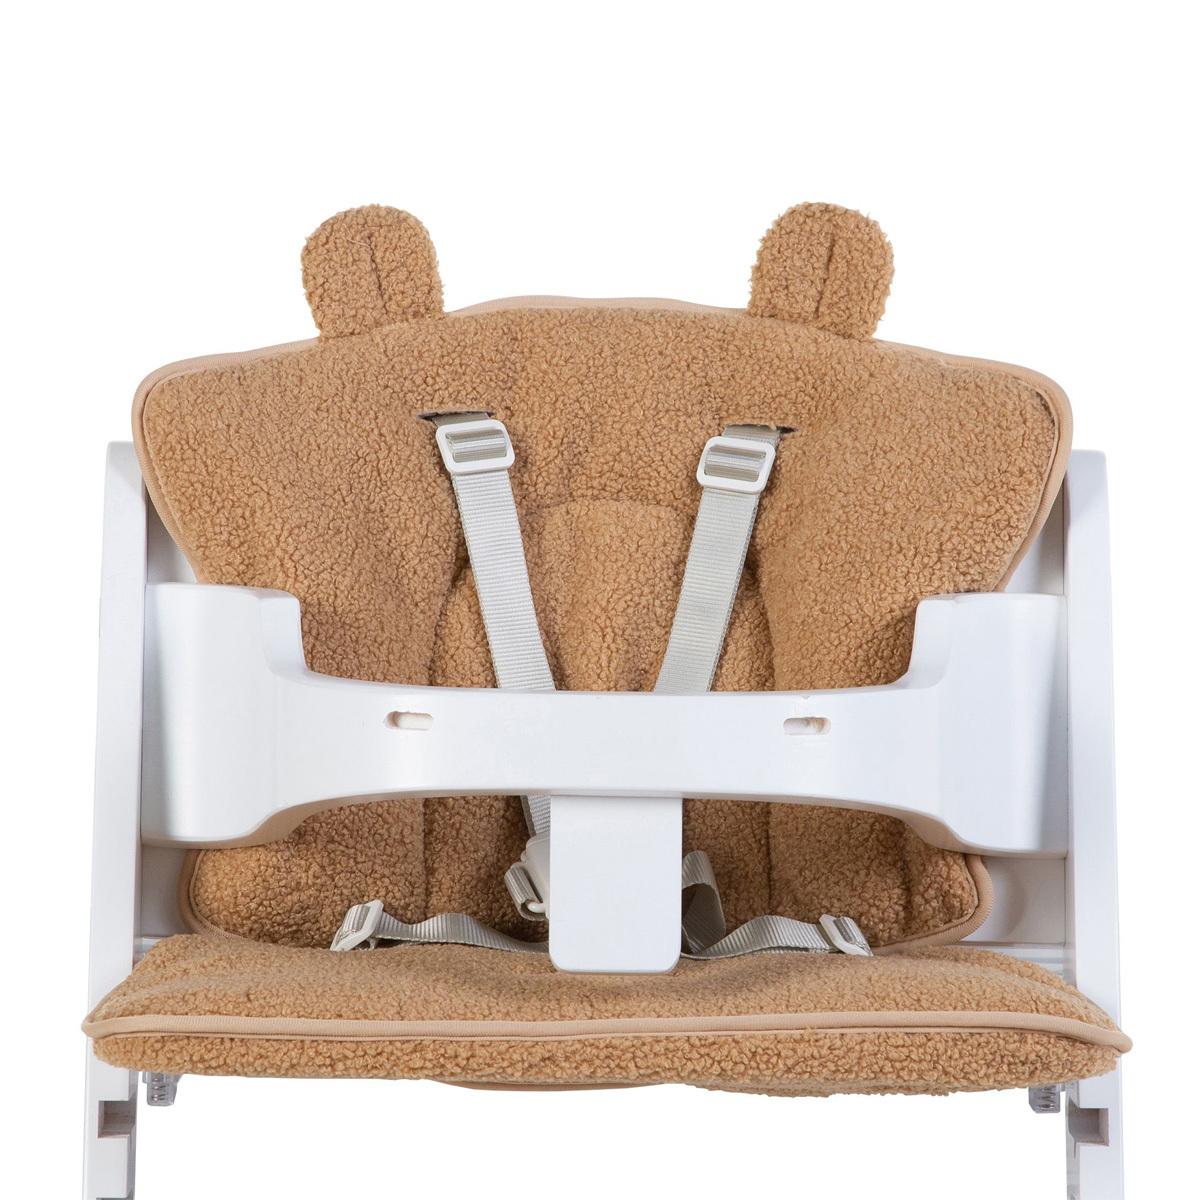 Chaise haute Coussin de Chaise Haute Evolutive Teddy - Beige Coussin de Chaise Haute Evolutive Teddy - Beige